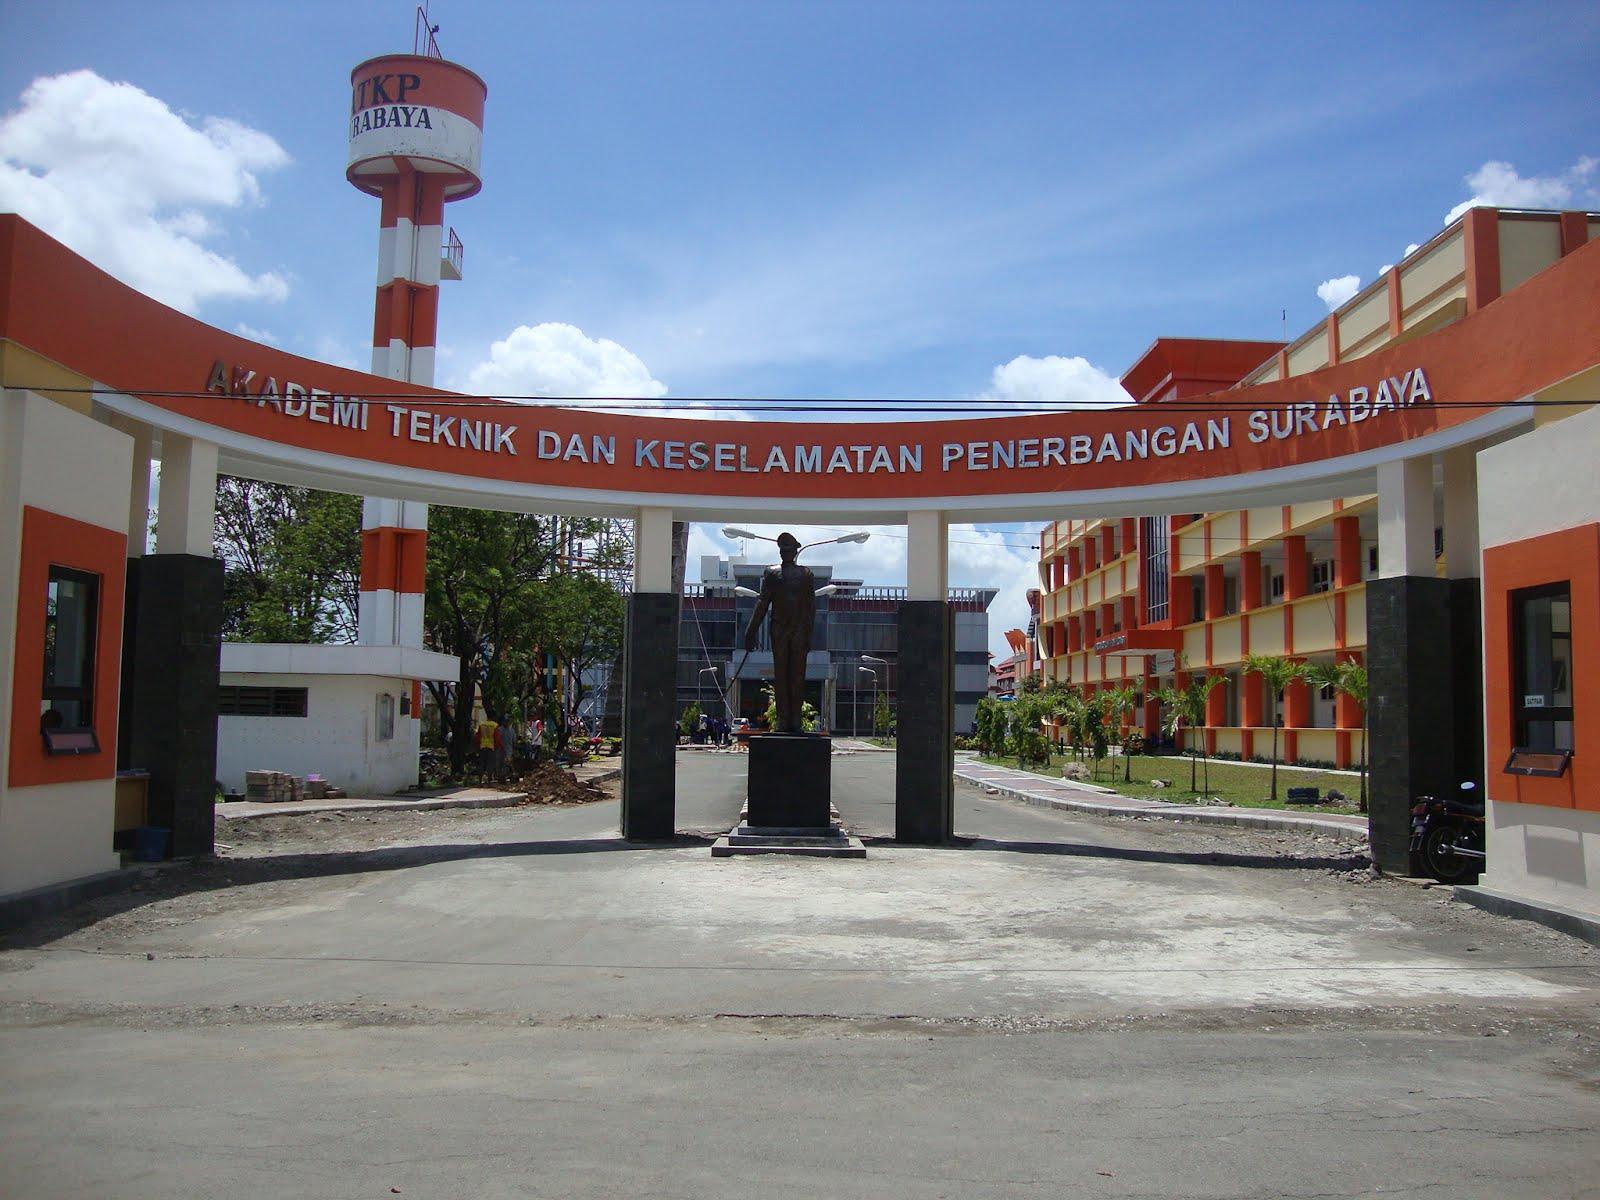 Pendaftaran Cpns Surabaya Tahun 2013 Lowongan Kerja Mayora Agustus 2016 Seleksi Surabaya Tinggi Jd Pemerintah Buka Jurusan Baru Di Atkps Yaitu Penerbang